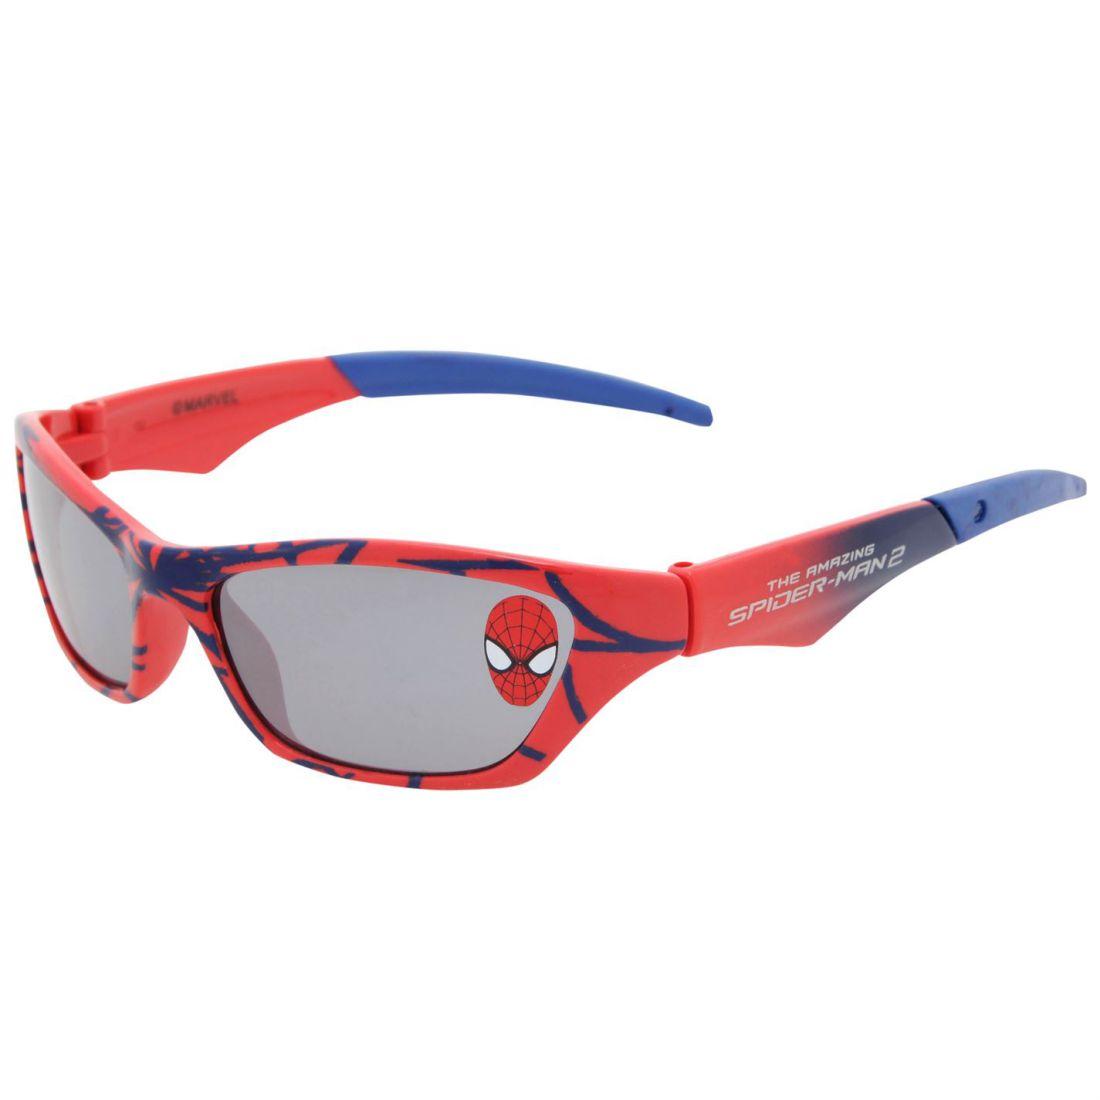 Character Kids Sunglasses Children Disney Character Spiderman Minnie Mouse  Frame | eBay